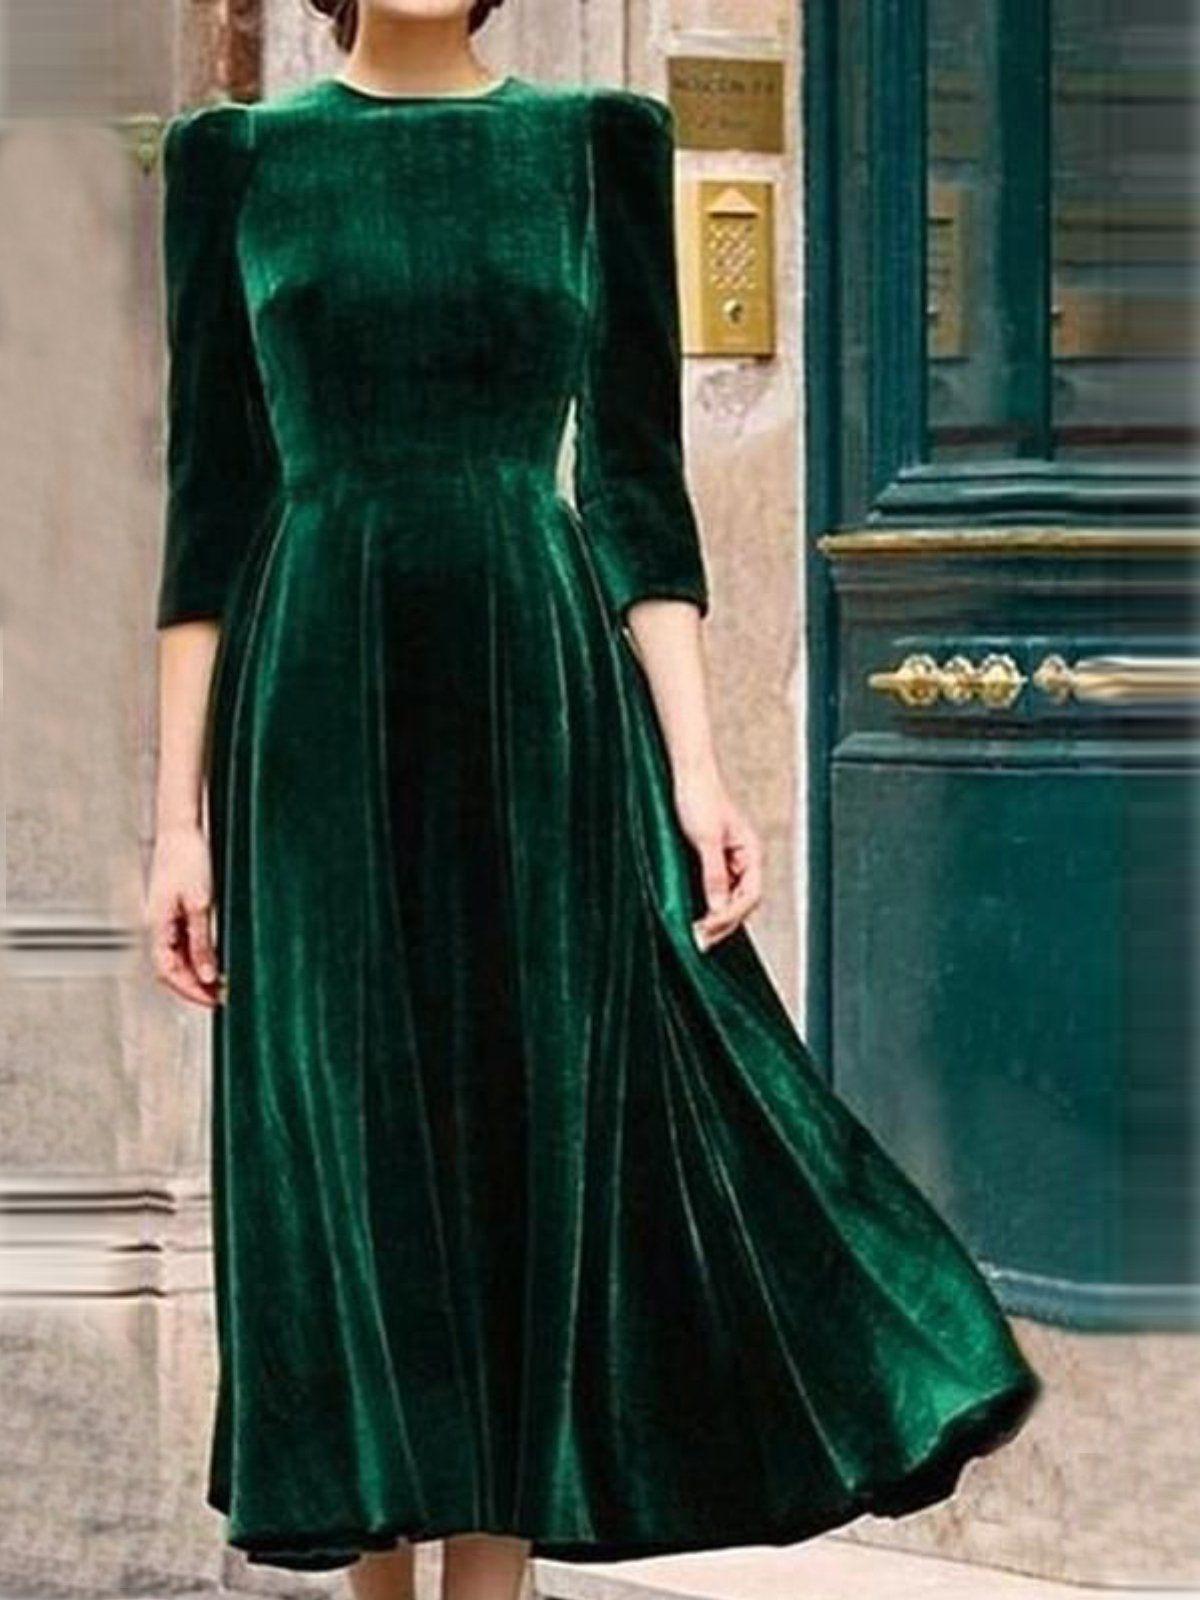 Army Green Vintage Velvet Dresses Vintage Velvet Dress Green Velvet Dress Maxi Dress Green [ 1600 x 1200 Pixel ]